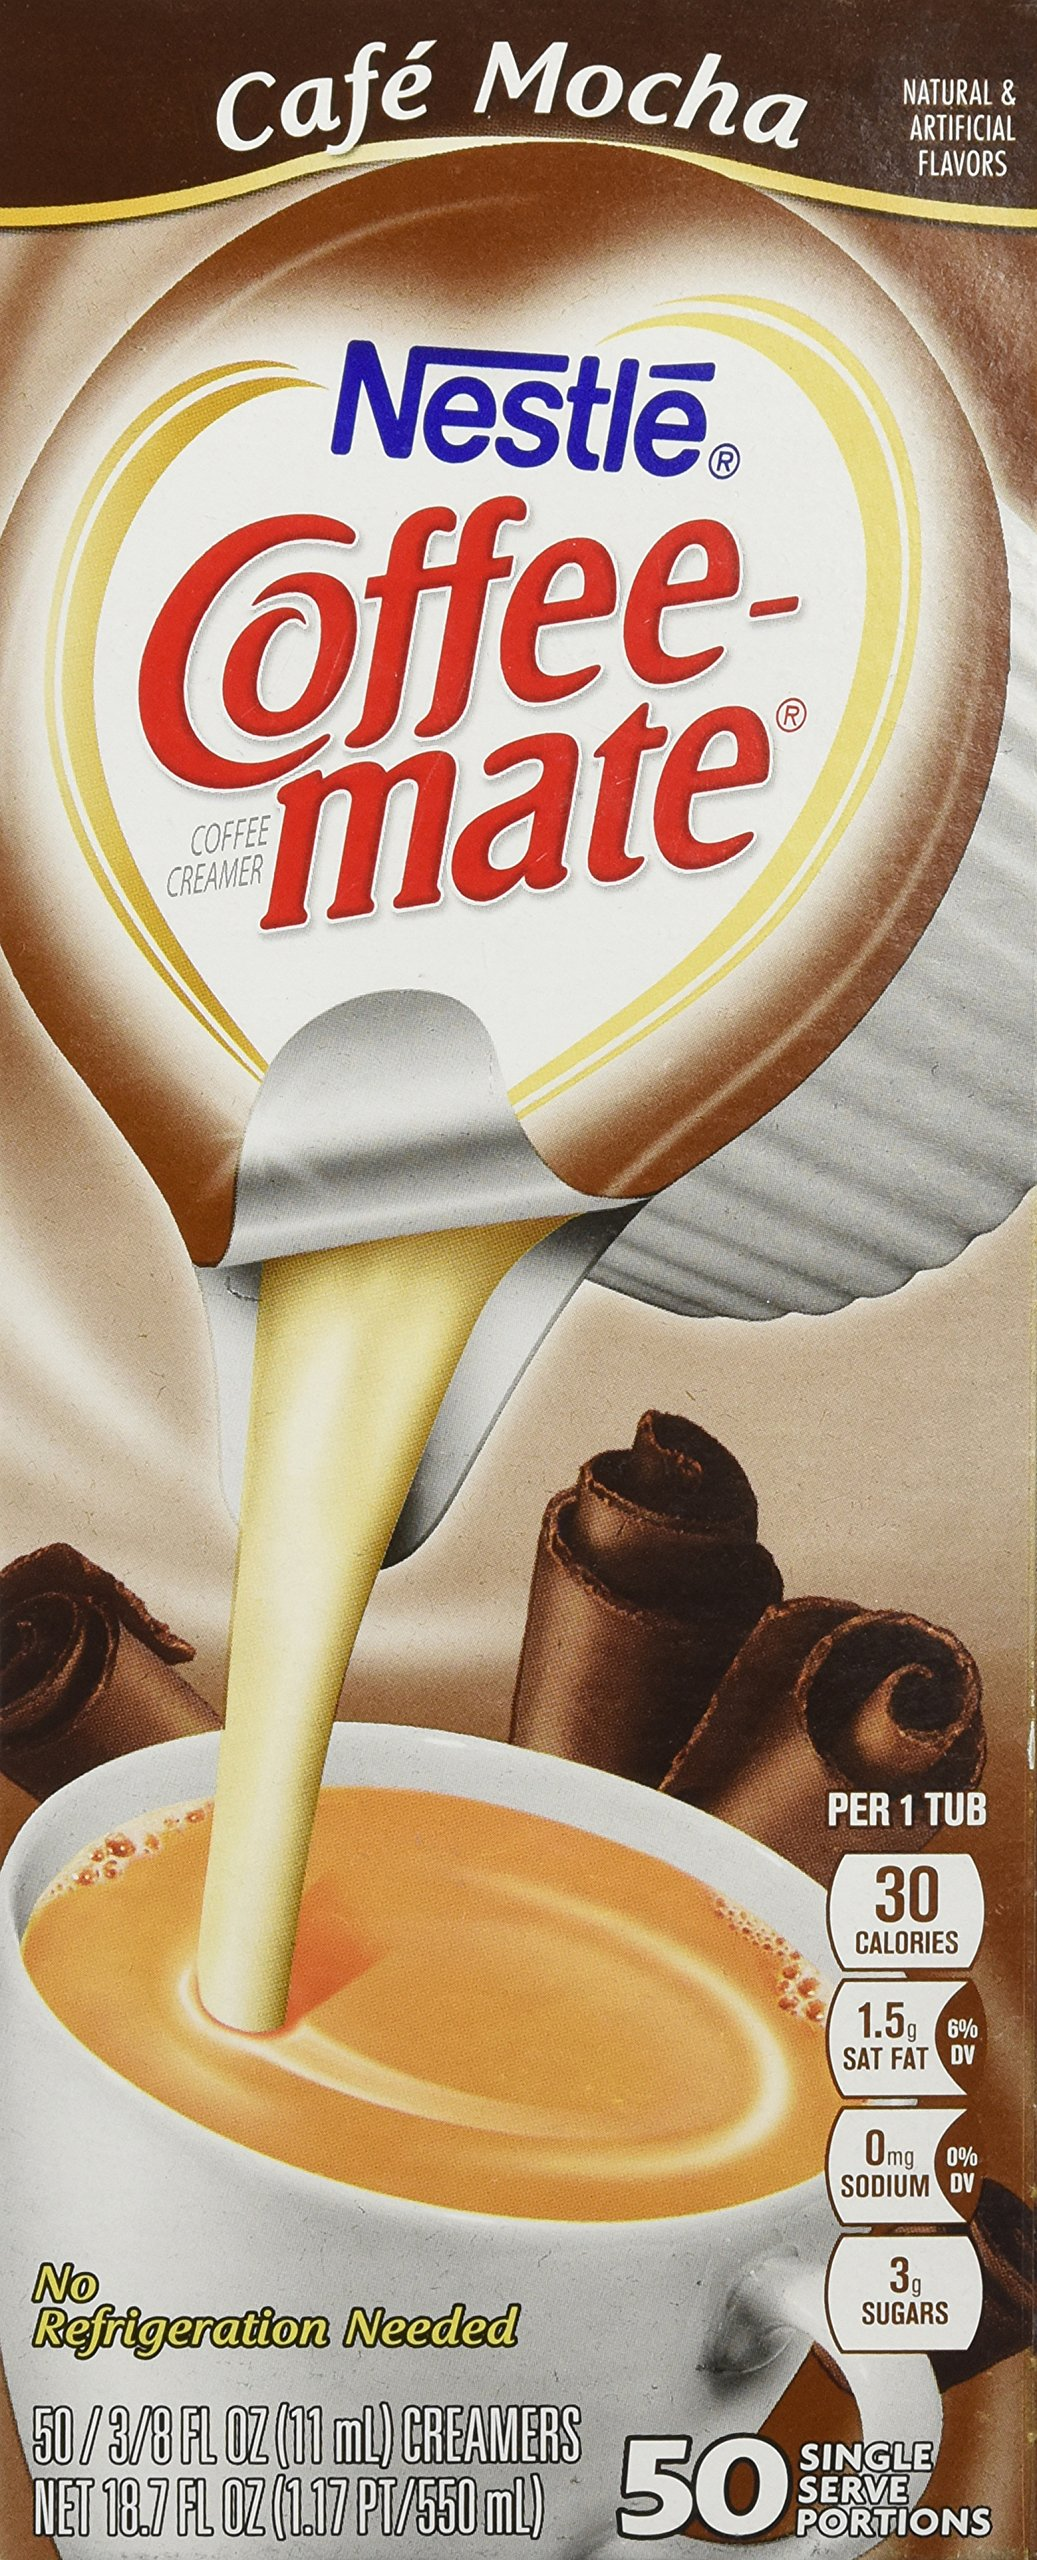 Coffee-mate Liquid Creamer Singles - Cafe Mocha - 50 ct